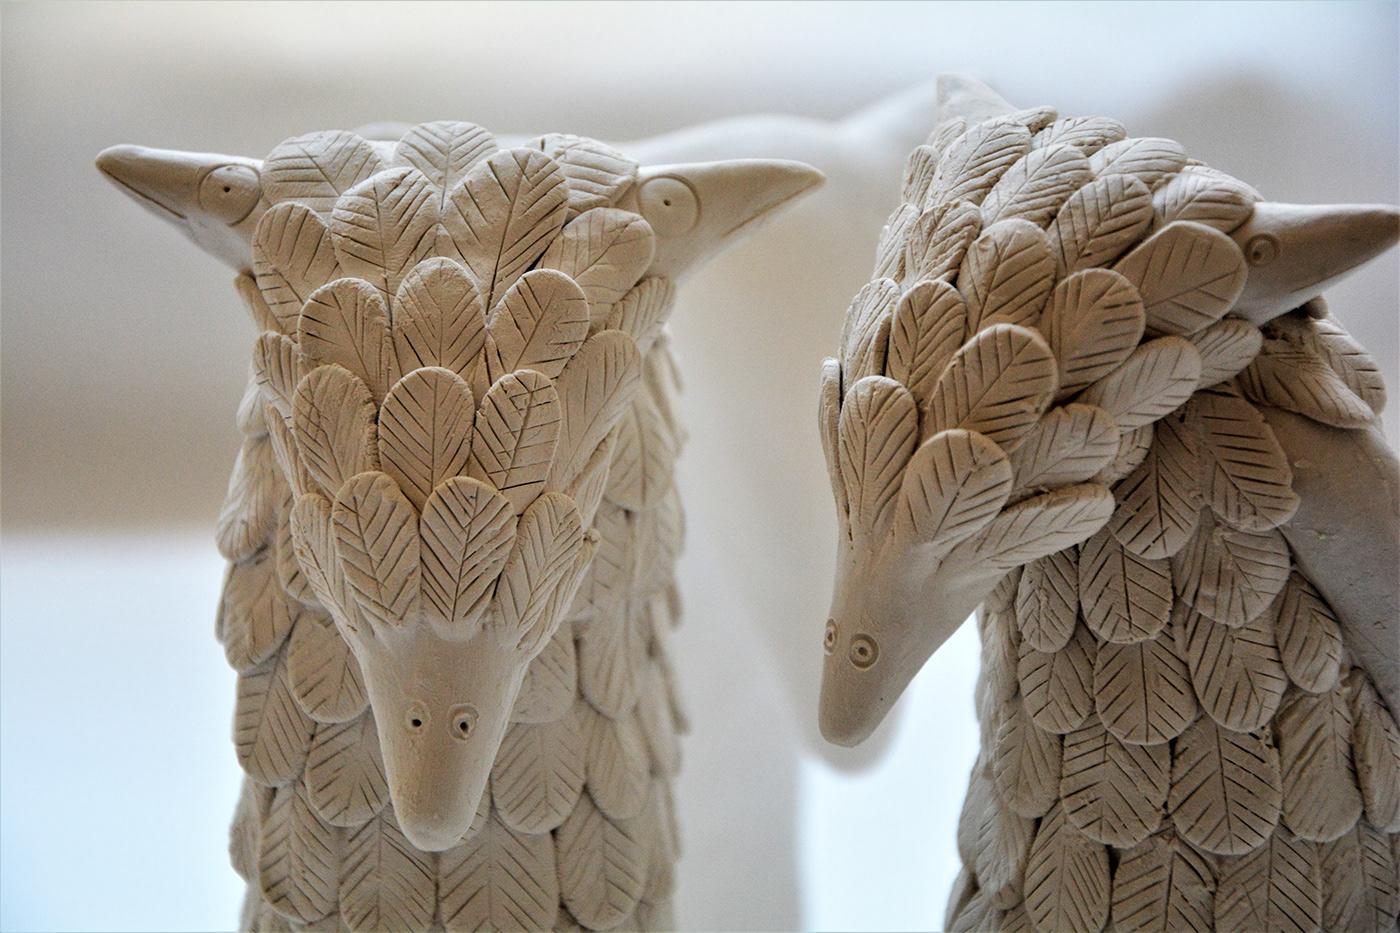 porcelain sculpture olivia weiss Füchse foxes plumage Federkleid contemporary ceramic